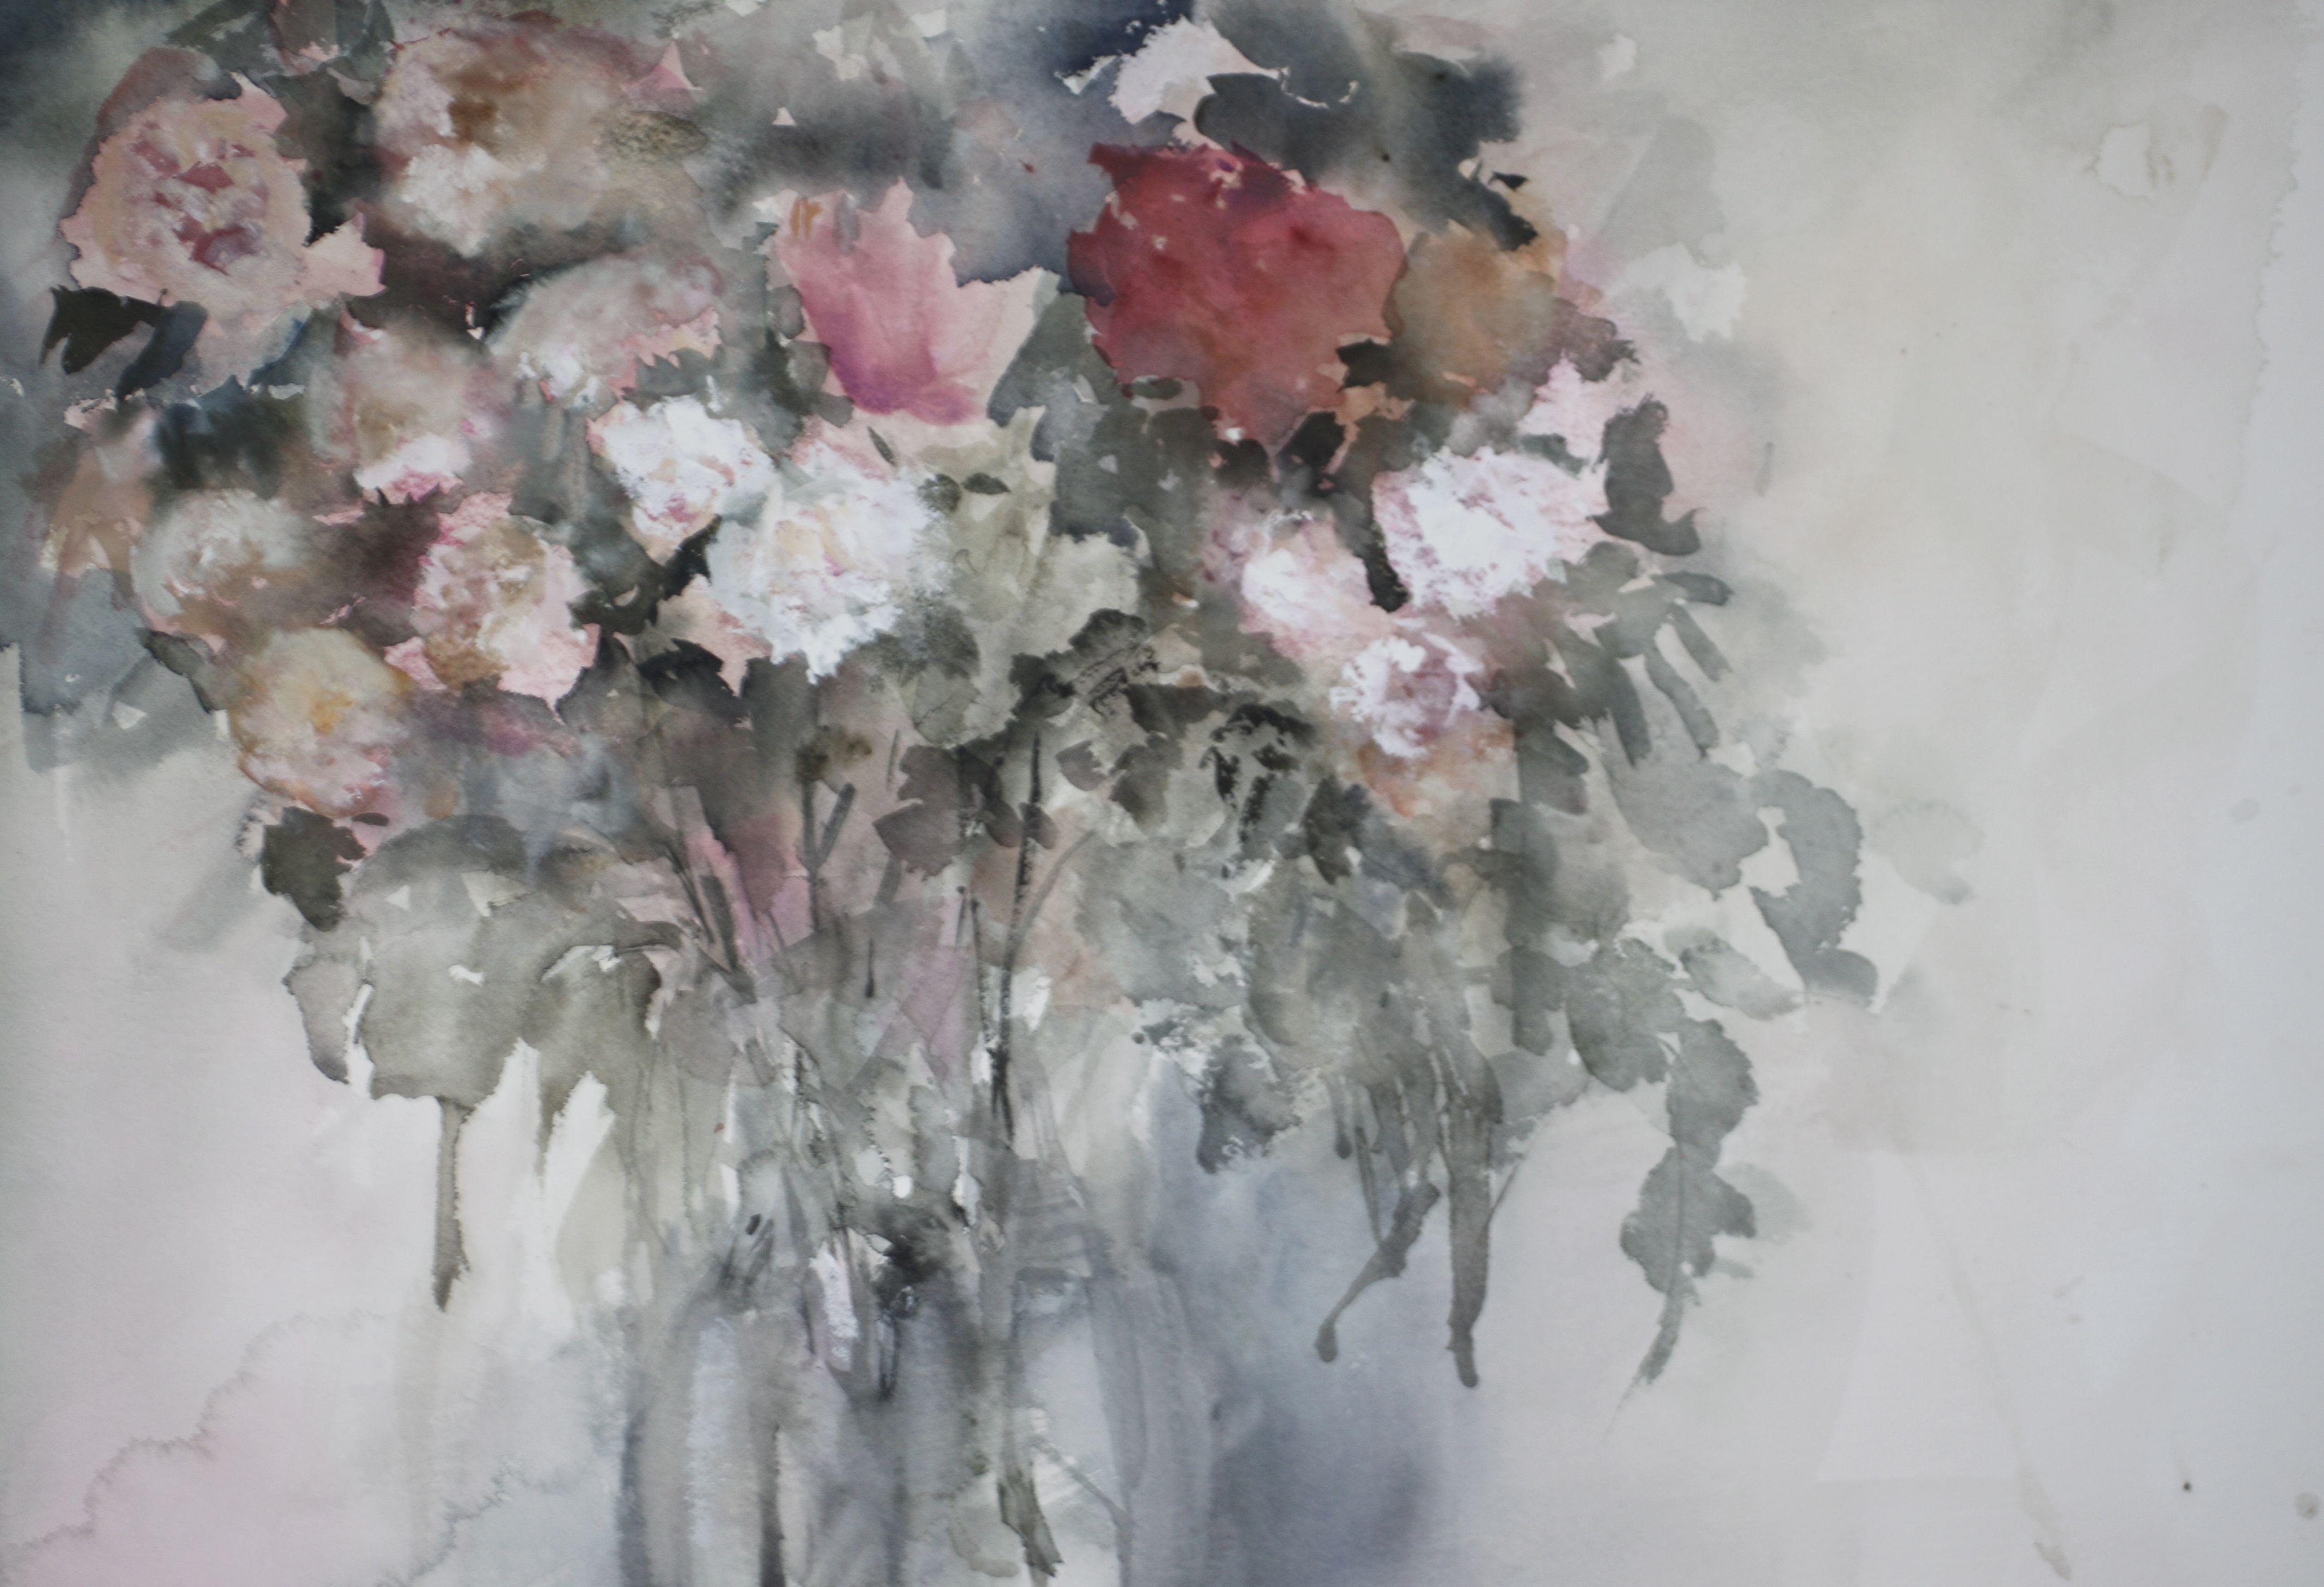 Flower bouquet / Ramo de flores - Watercolour / Acuarela